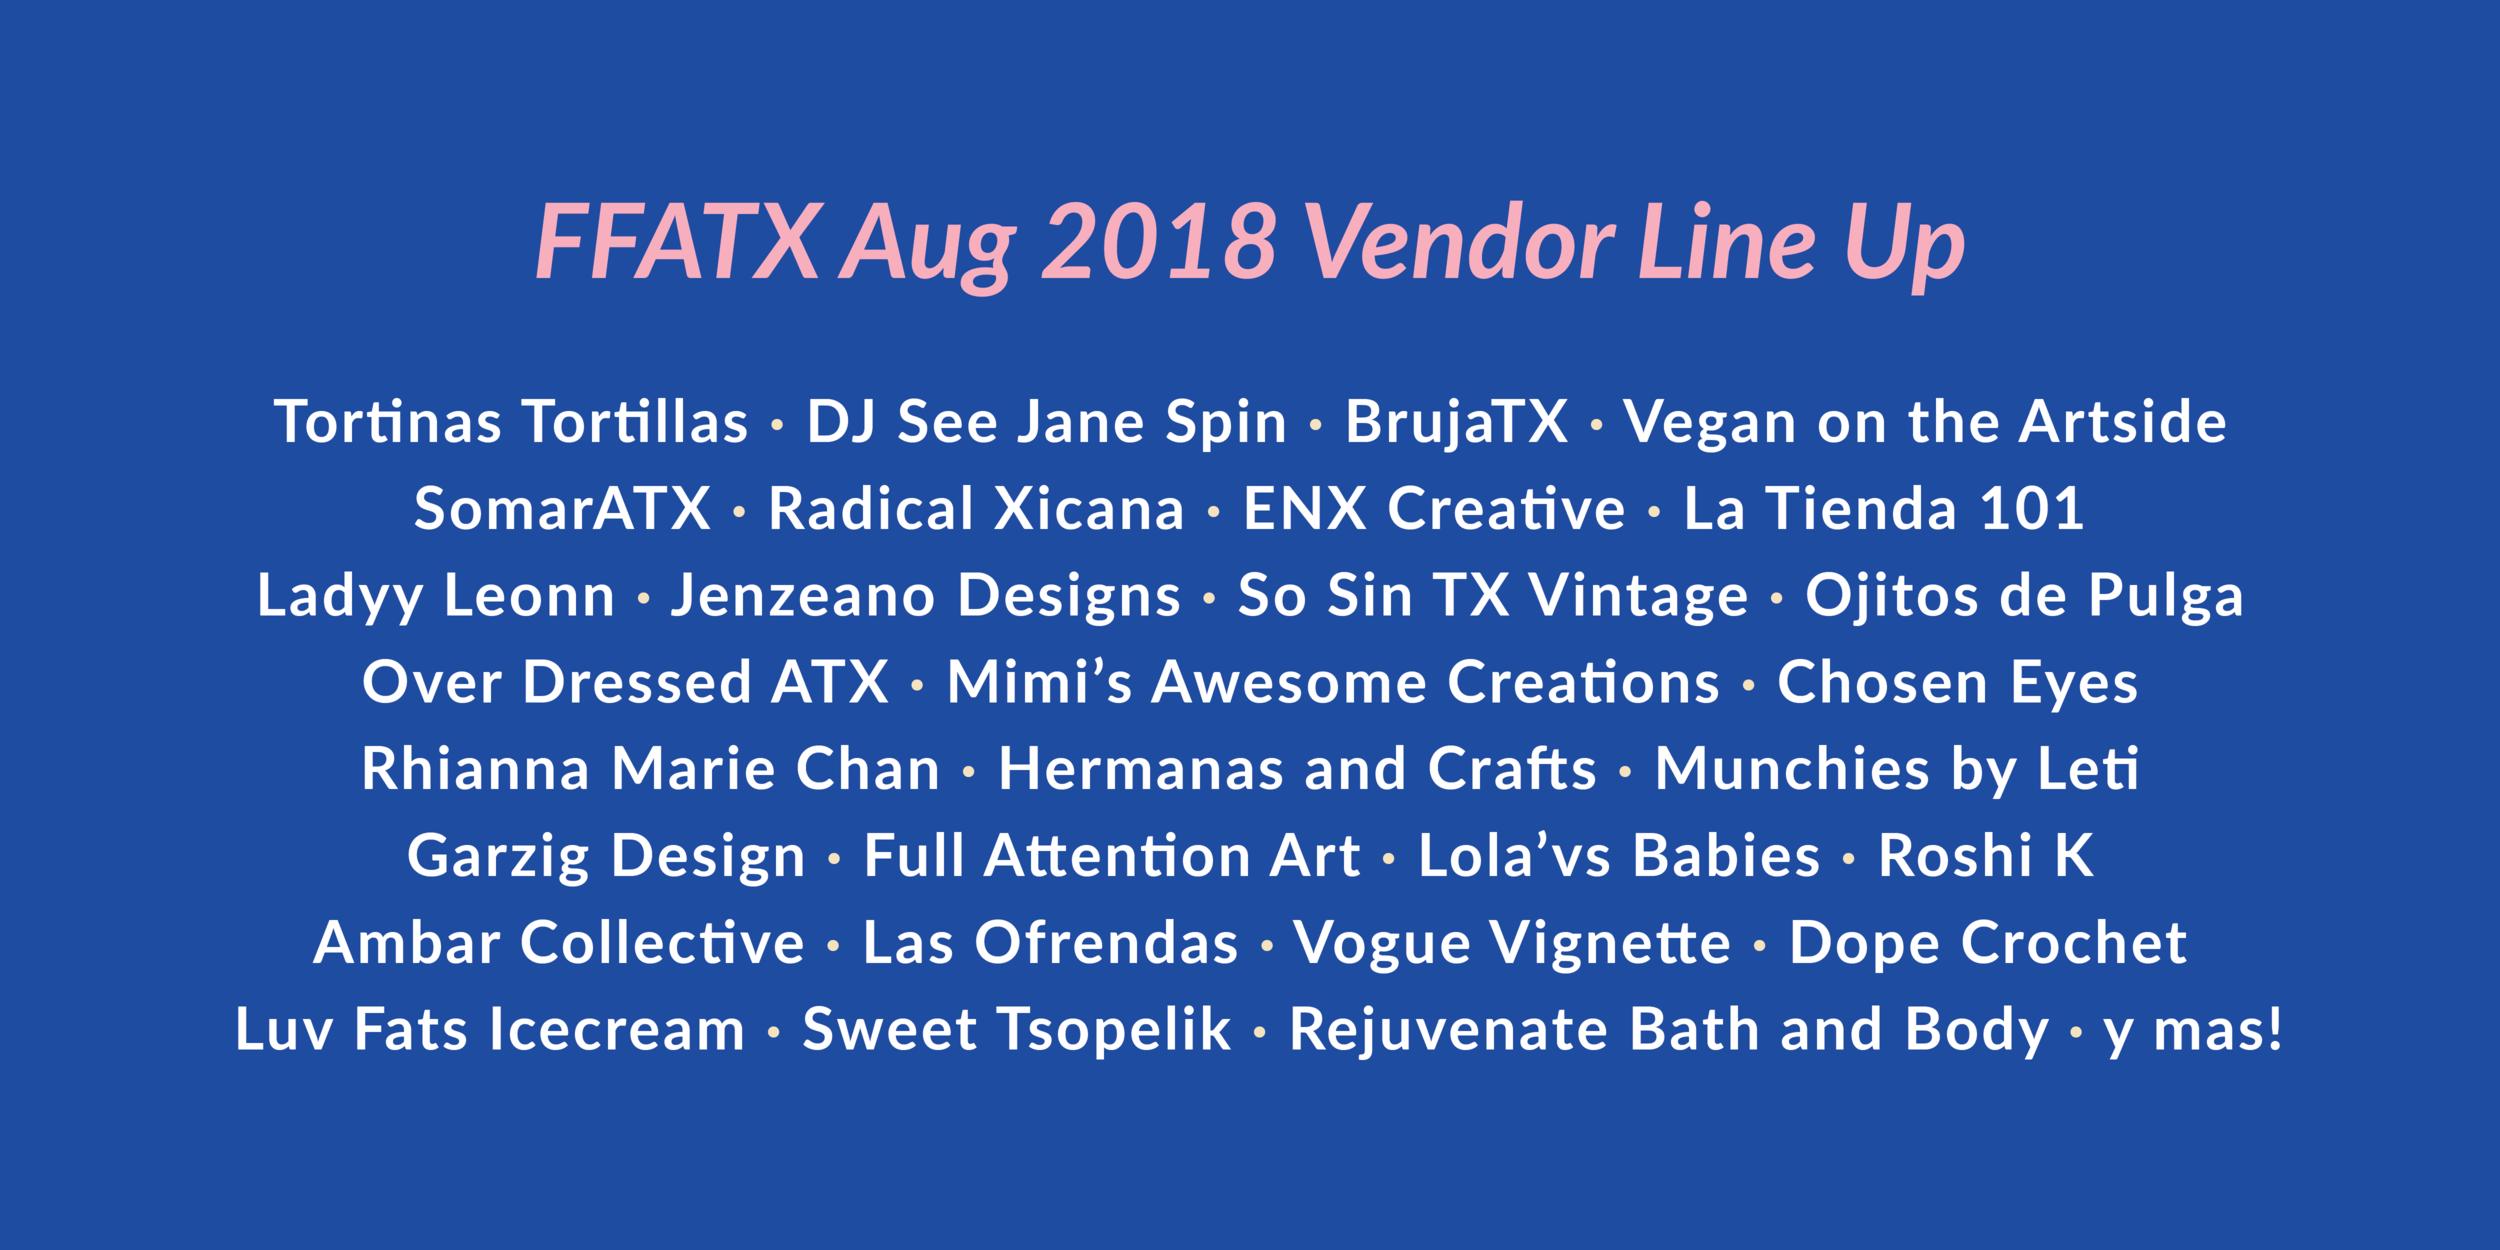 FF-Aug2018-Vendors.png